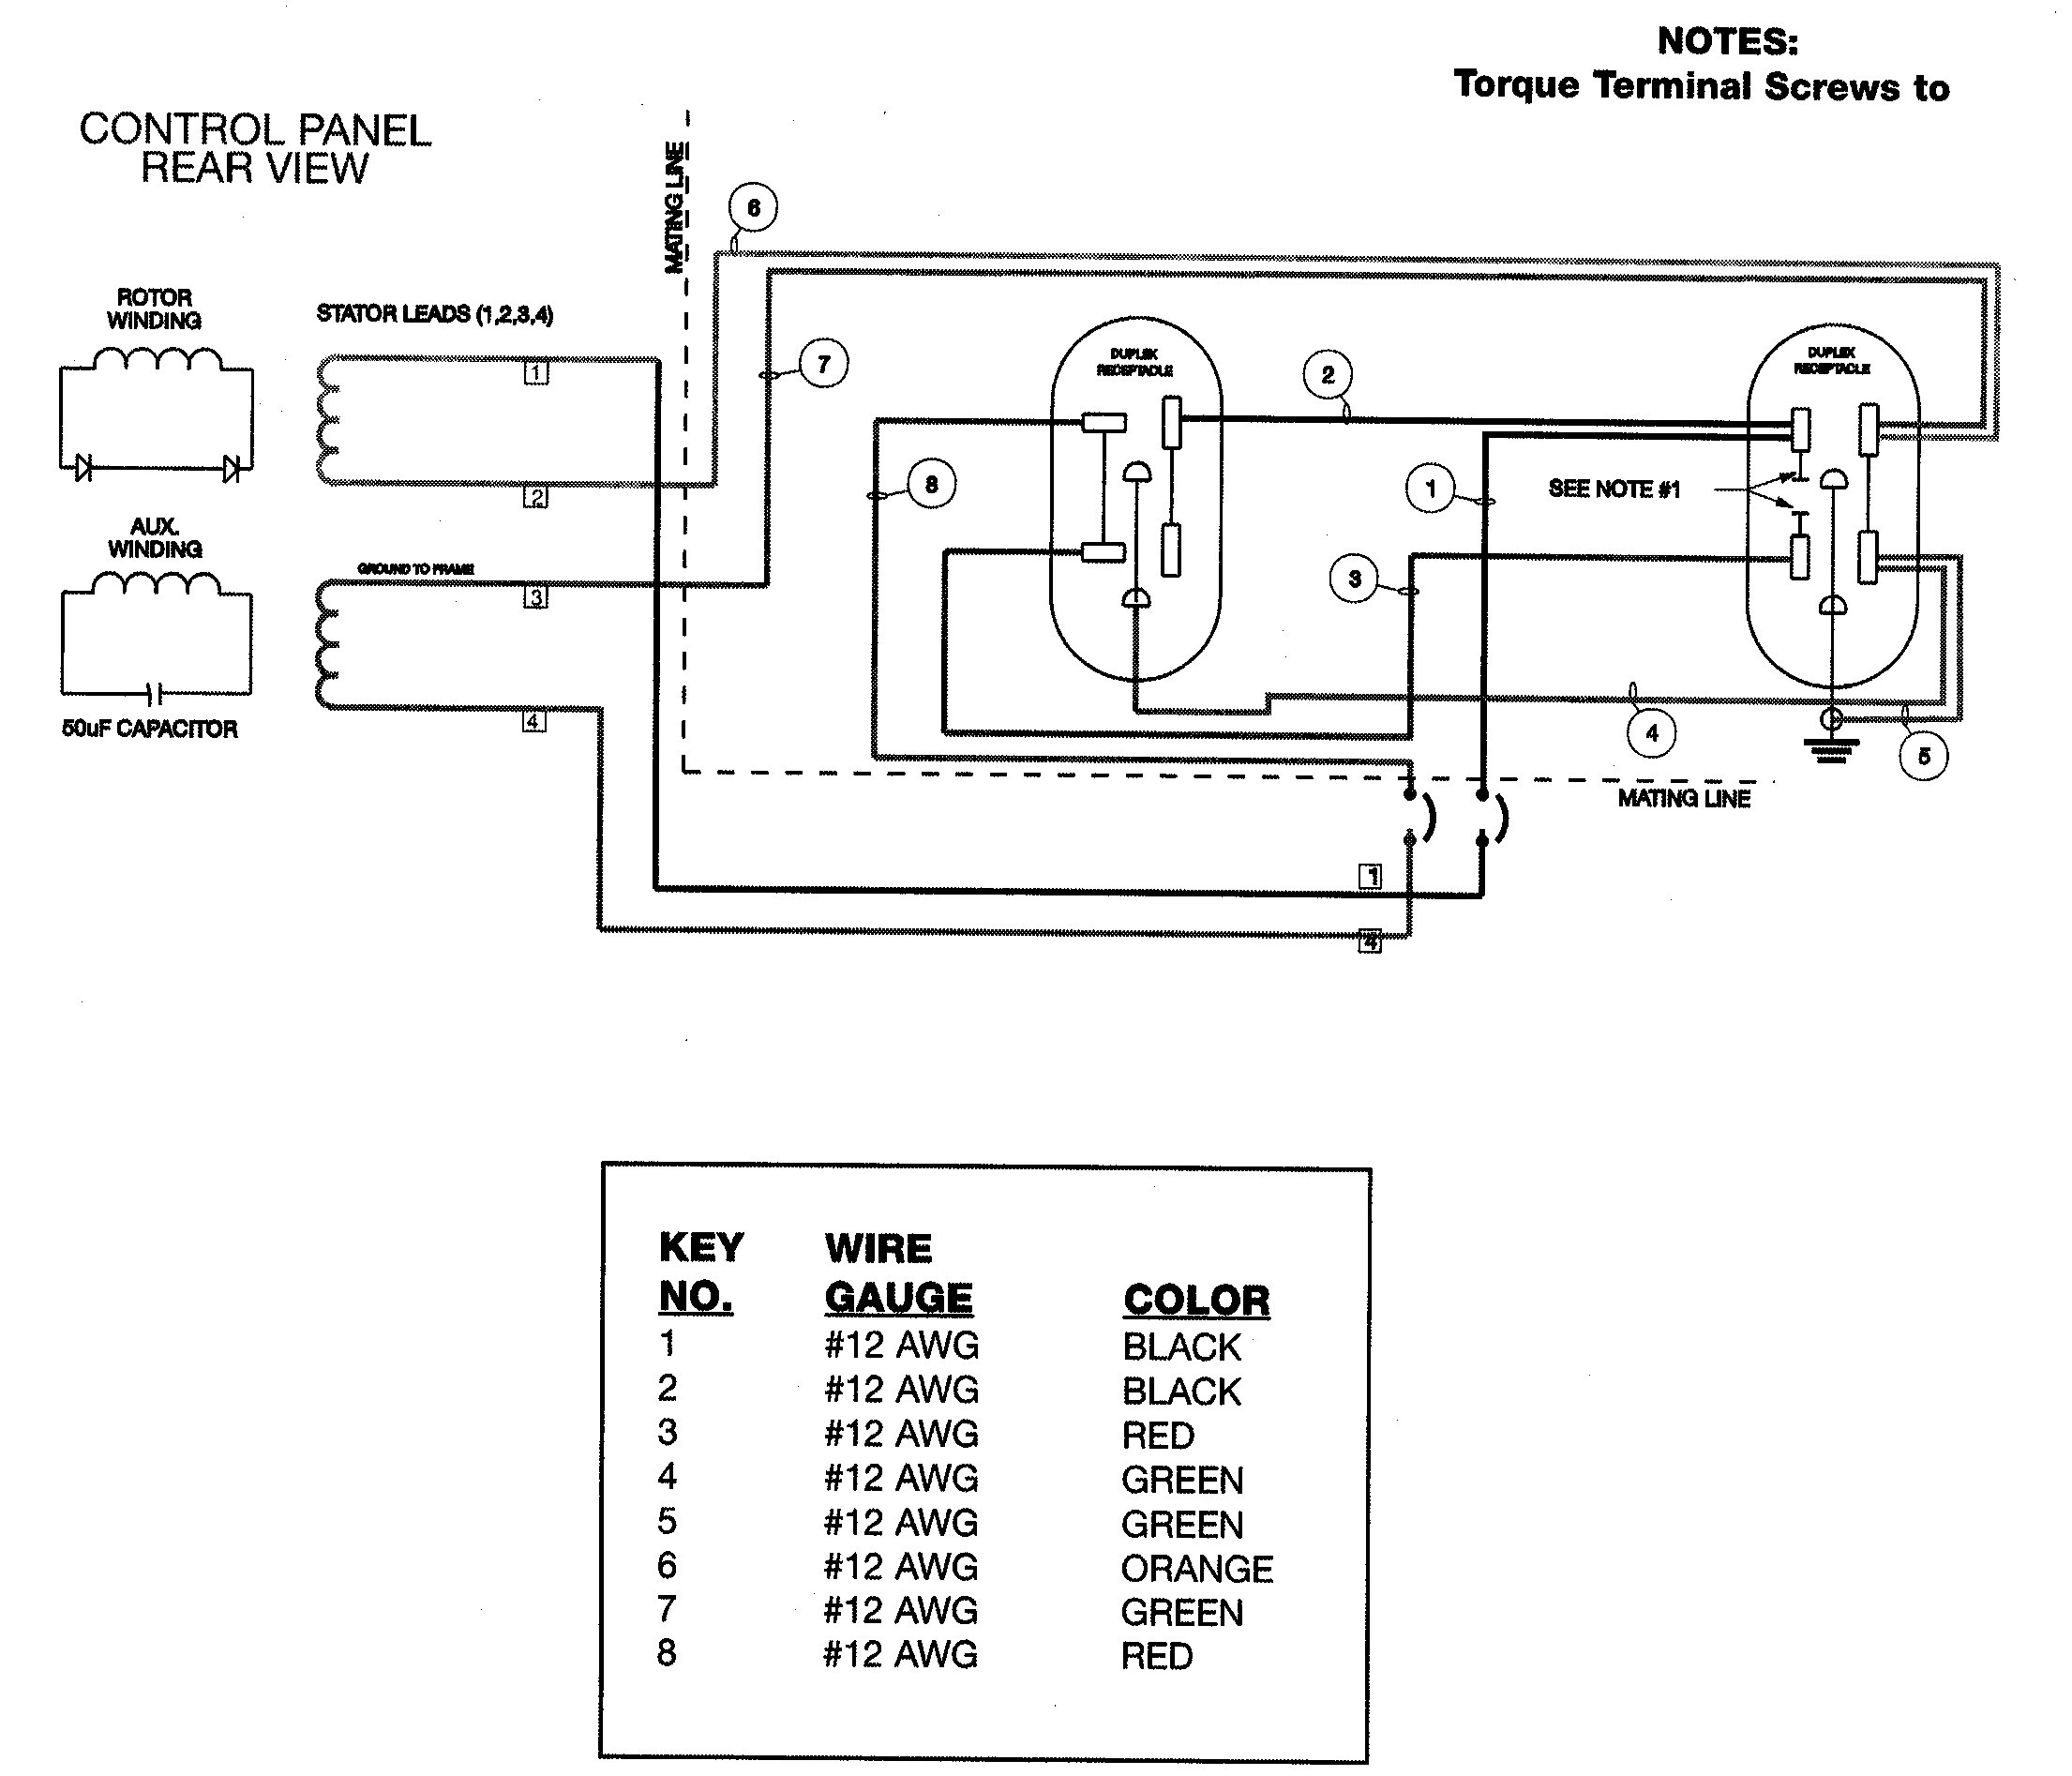 4 Prong Twist Lock Plug Wiring Diagram Fresh Cool L14 30 Plug Wiring Diagram Electrical and